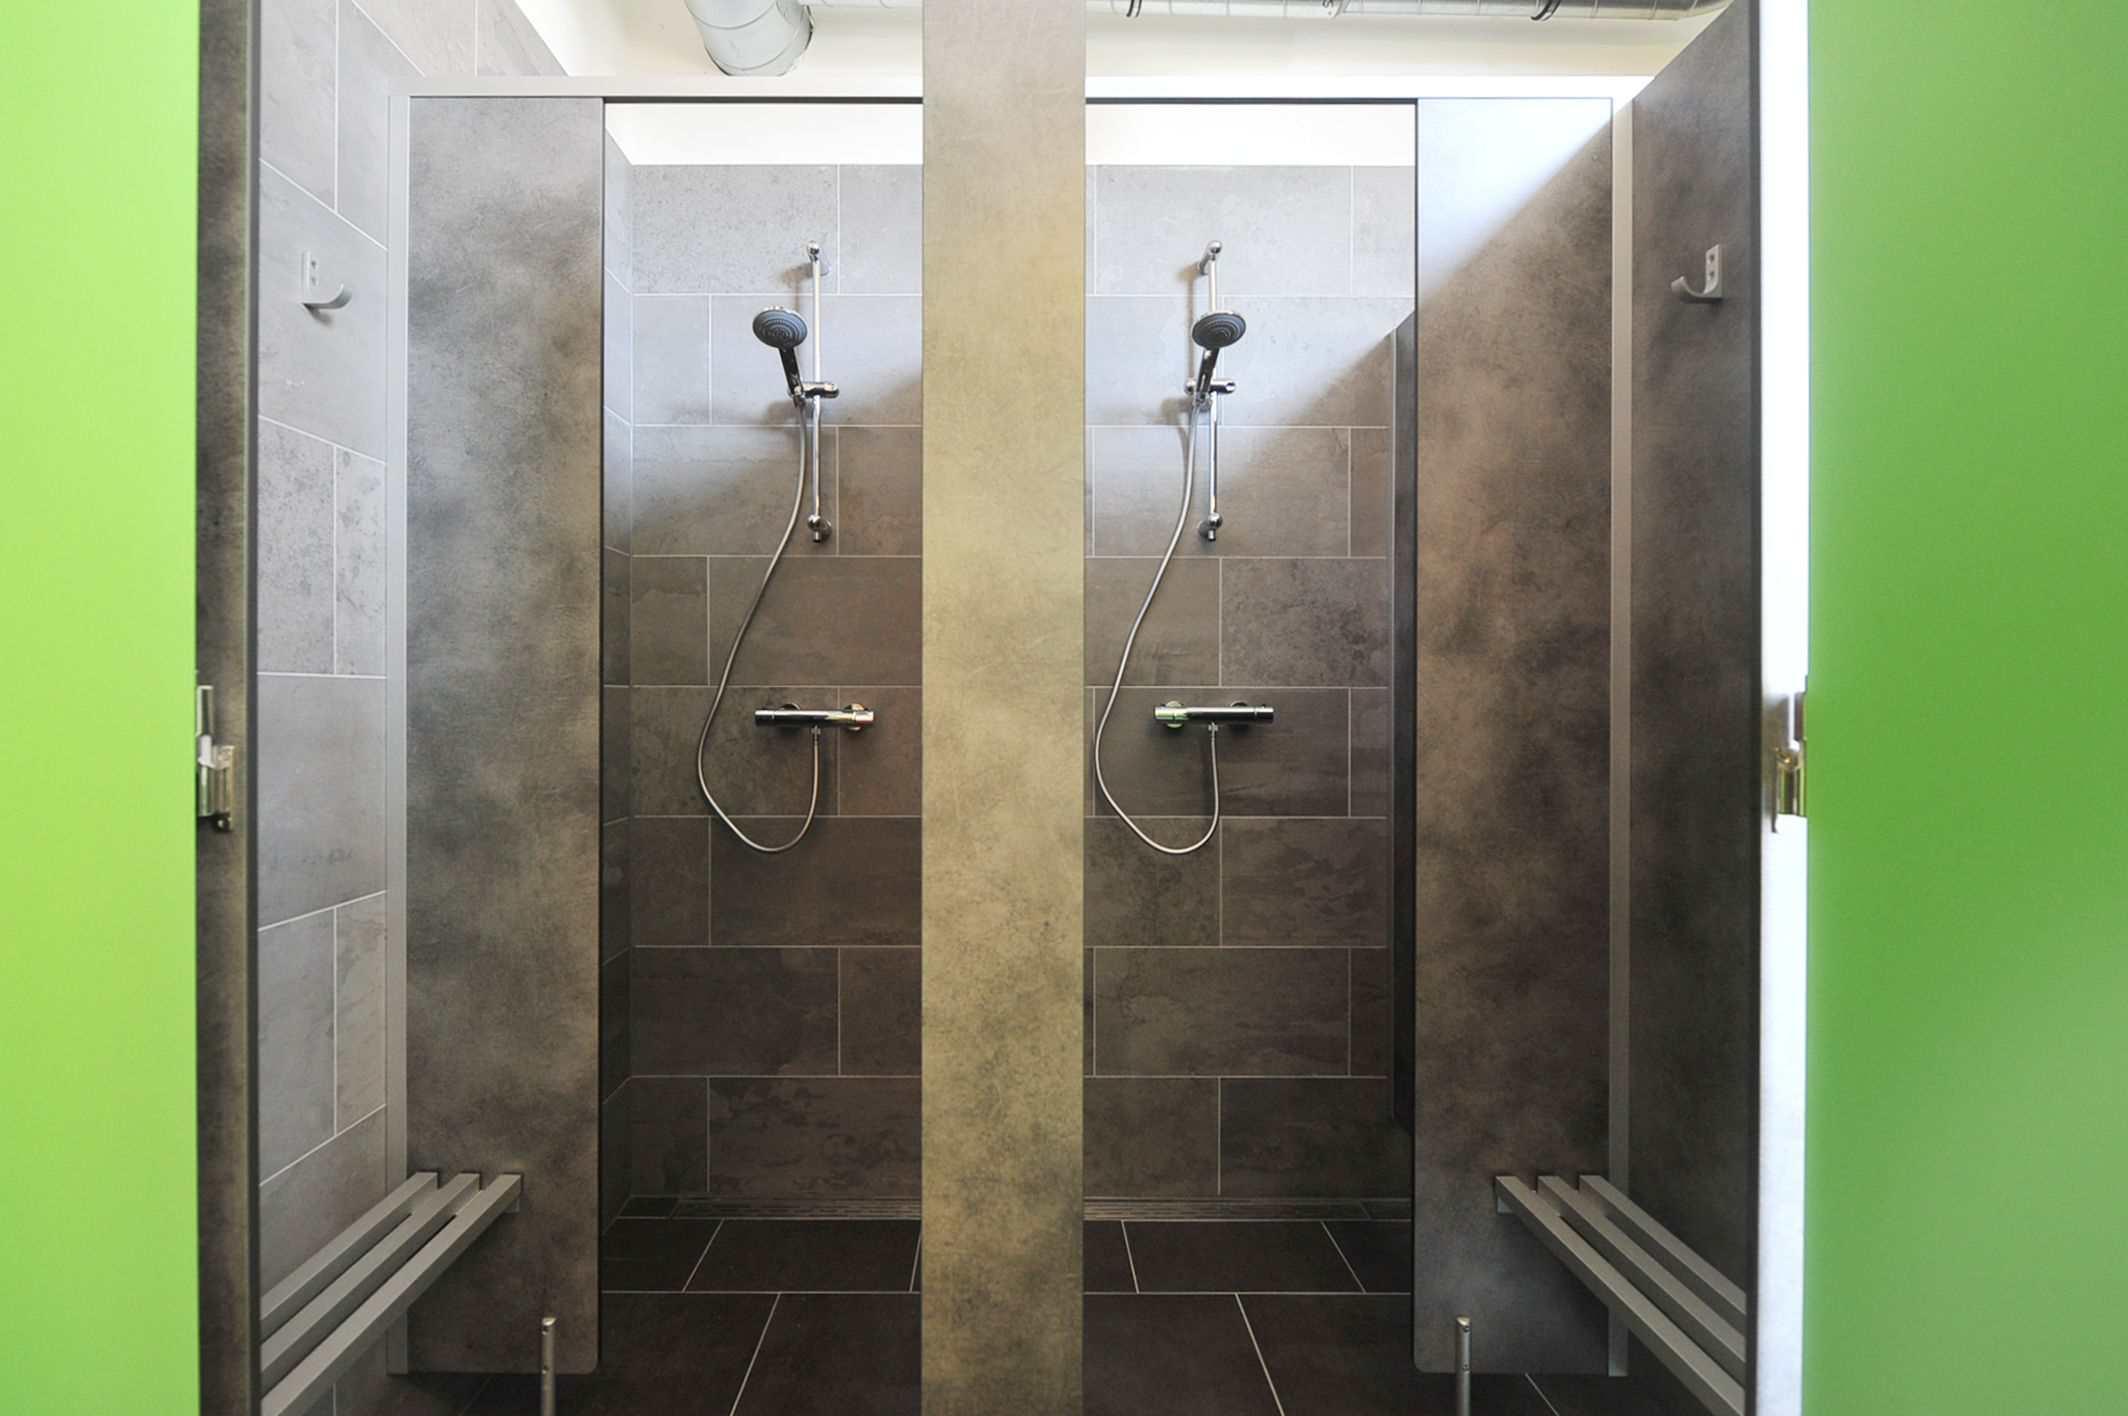 Communal Showers at Kingkool The Hague City Hostel